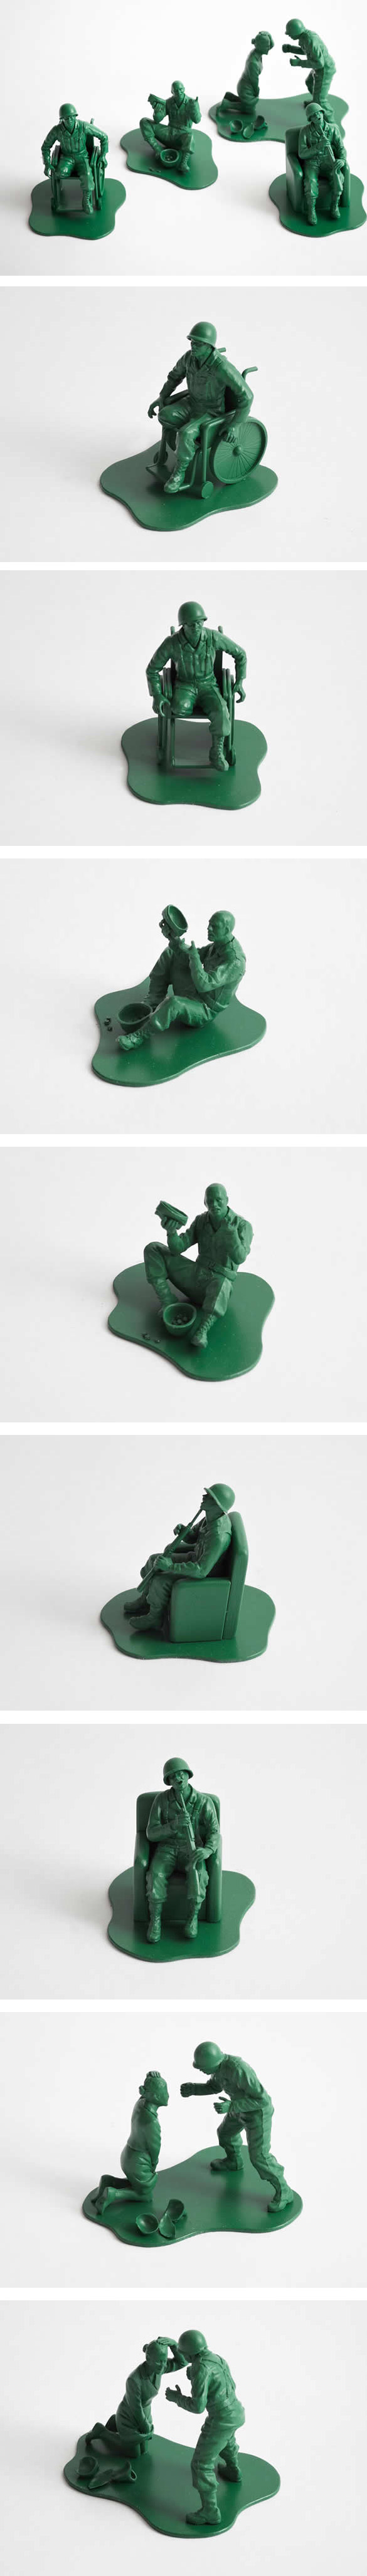 Petit soldat vert jouet realiste Petit soldat vert jouet realiste